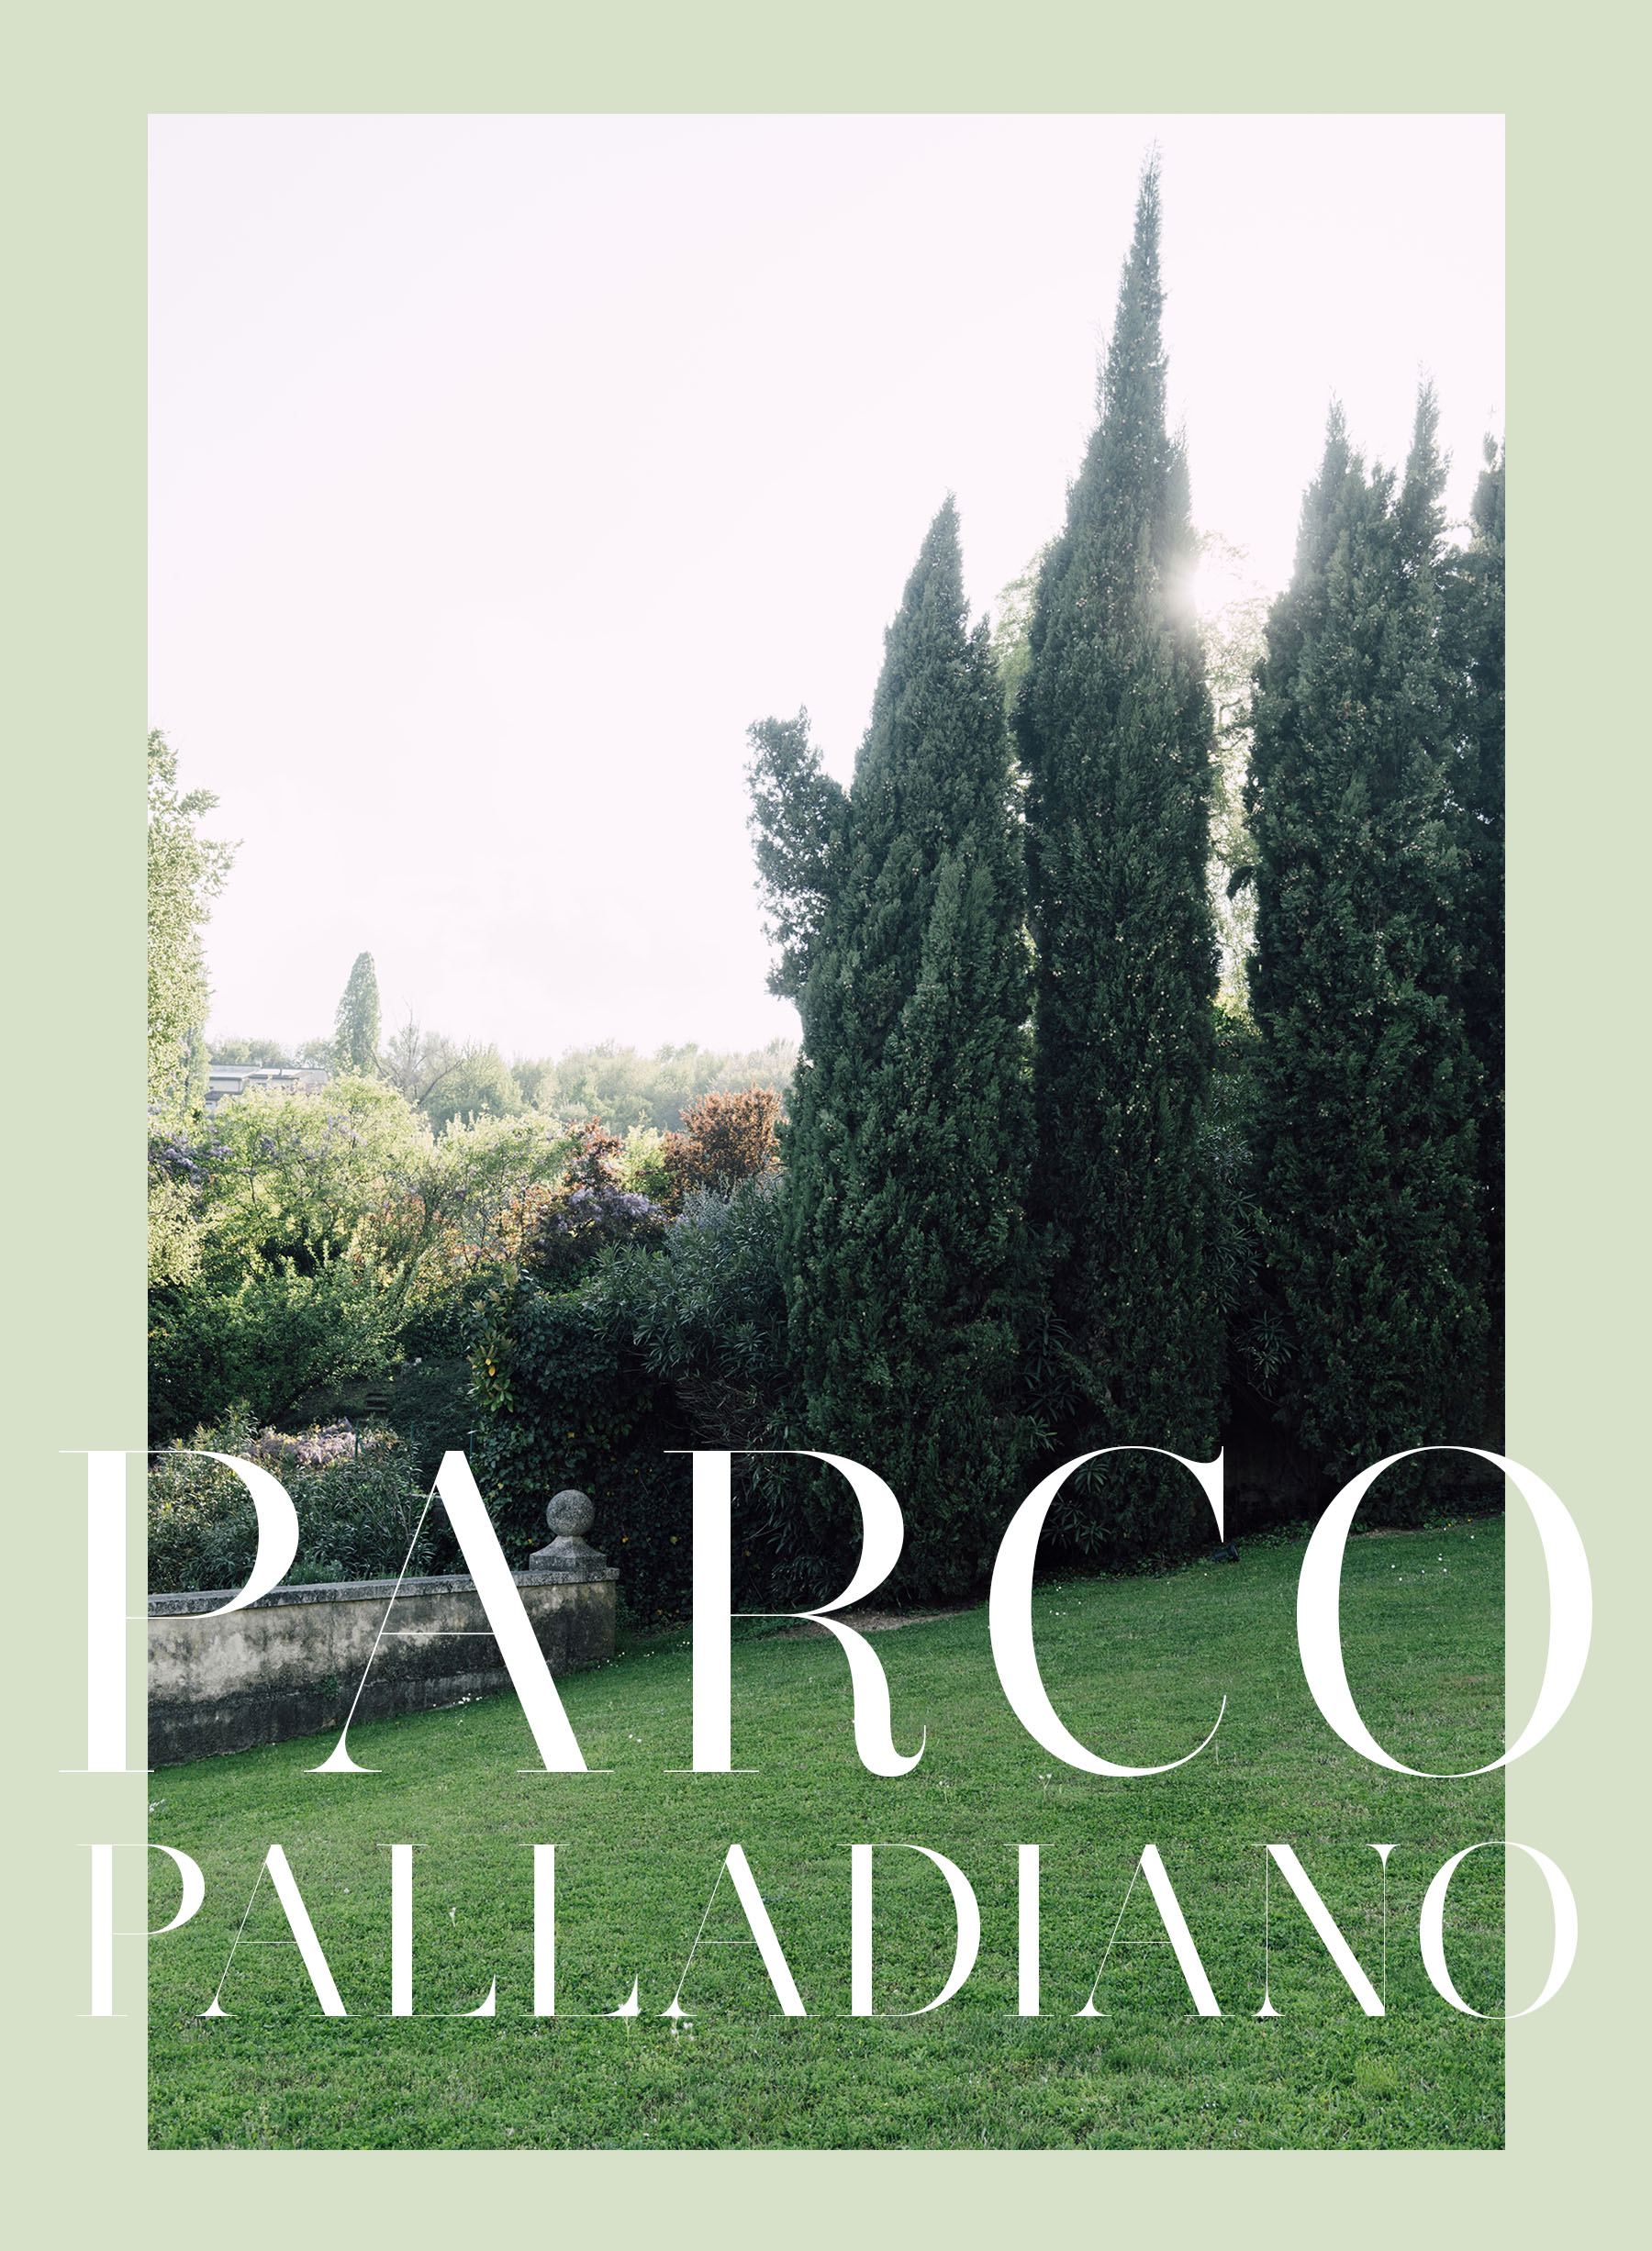 904b08d701 lingered upon  Bottega Veneta s Parco Palladiano